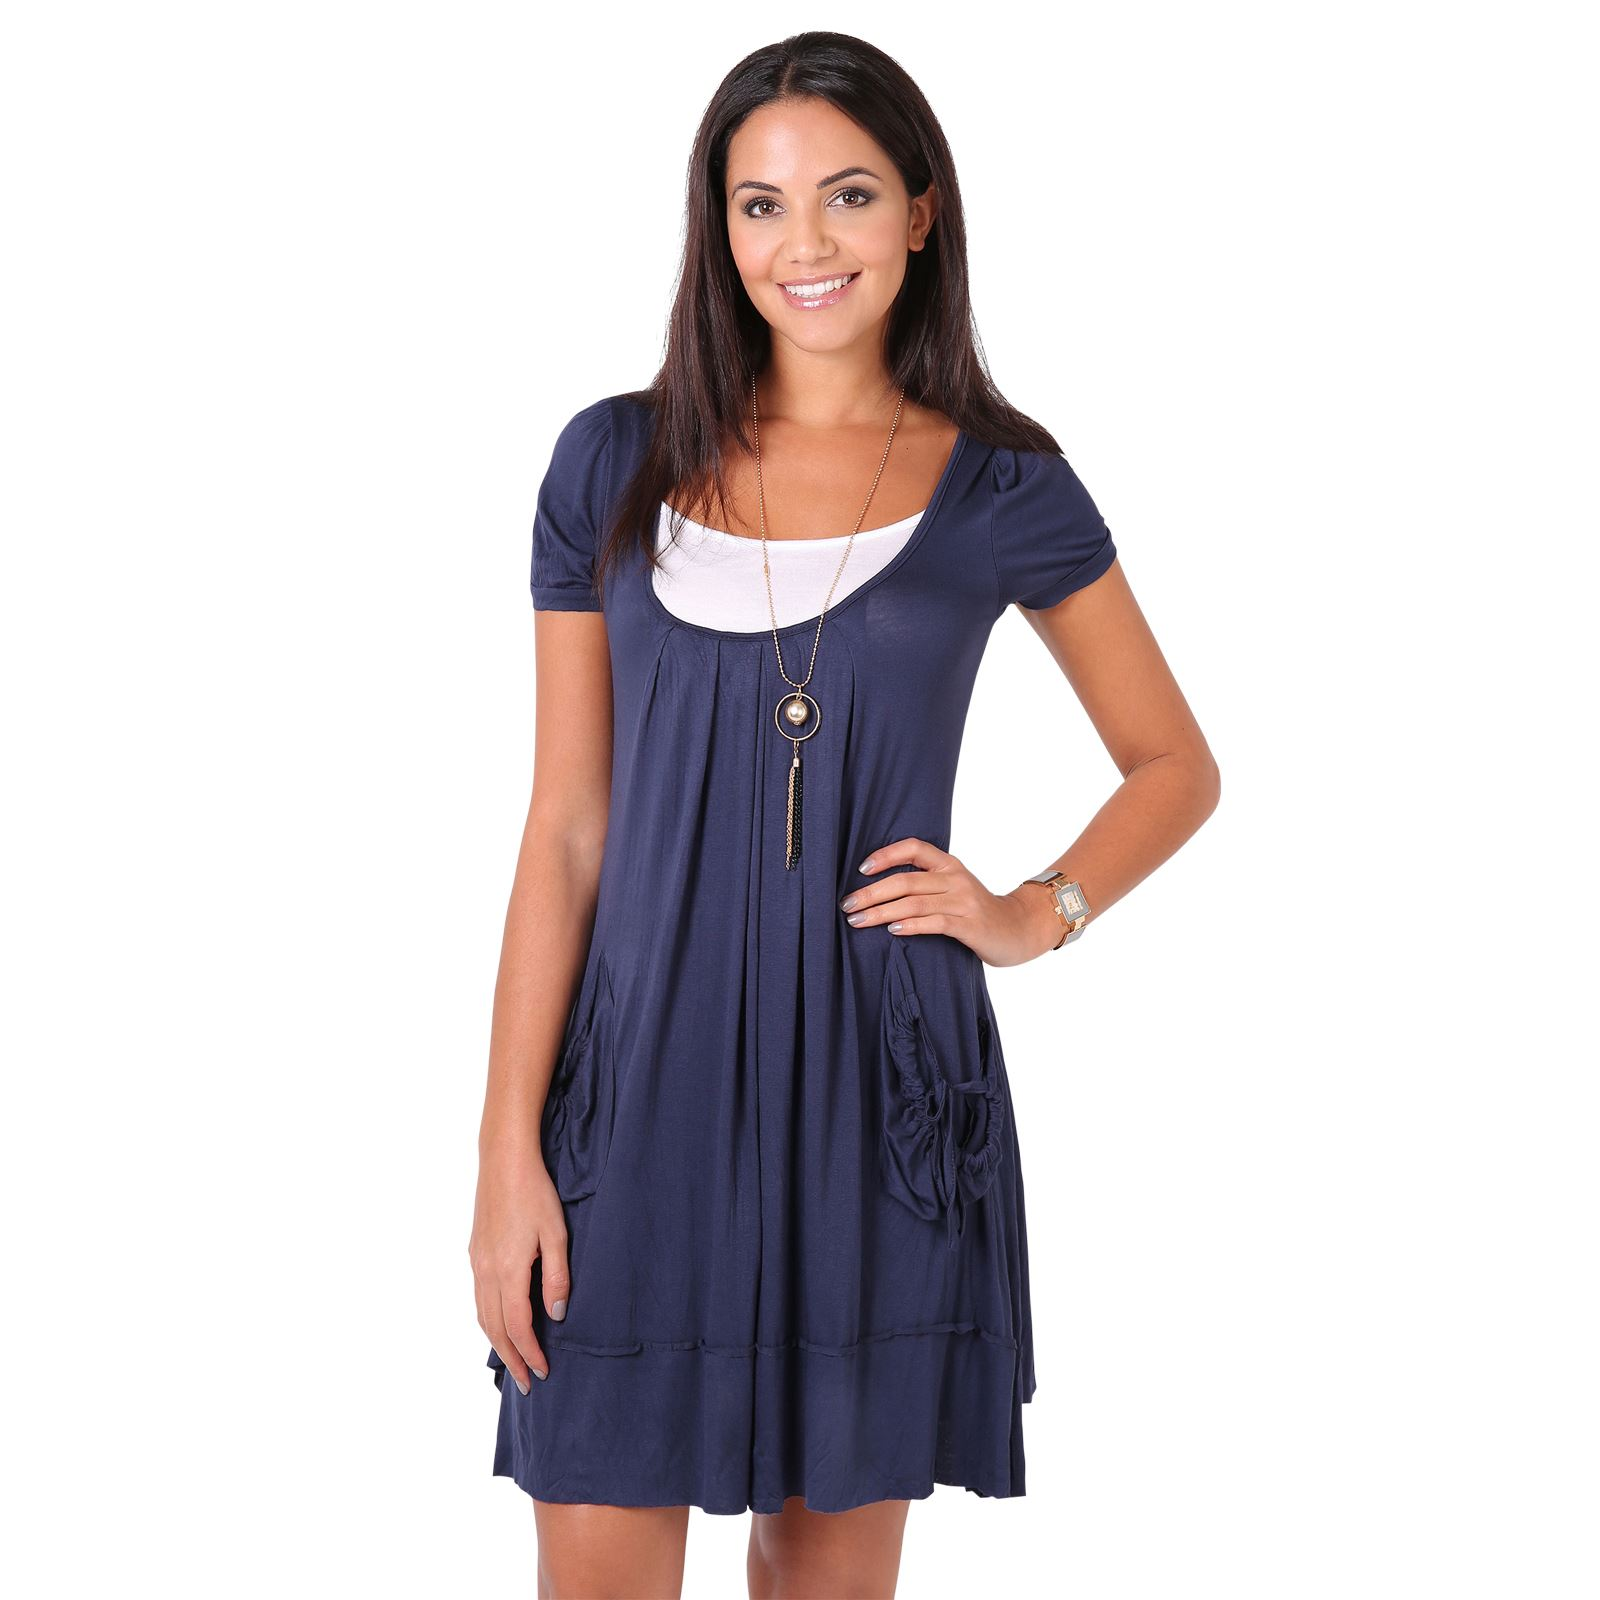 femmes top tunique robe manche courte col rond ample large tendance boho mode ebay. Black Bedroom Furniture Sets. Home Design Ideas